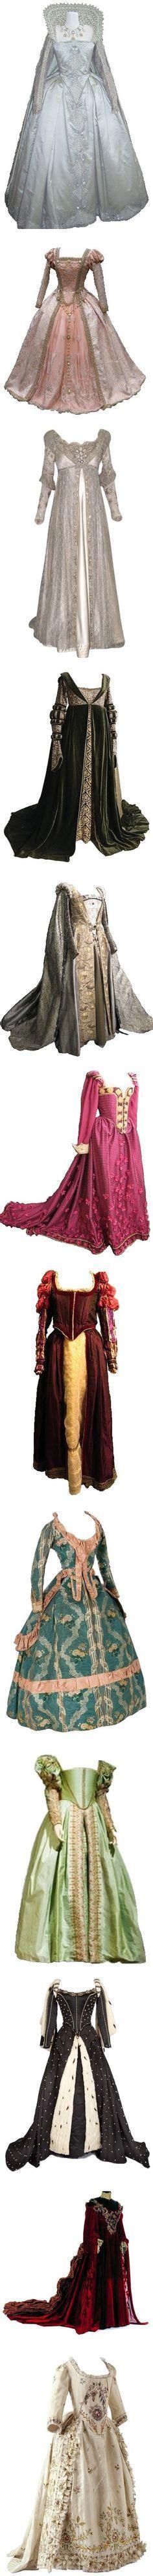 Lv Dress Cerry quot romeo juliet quot costume sketches dresses and